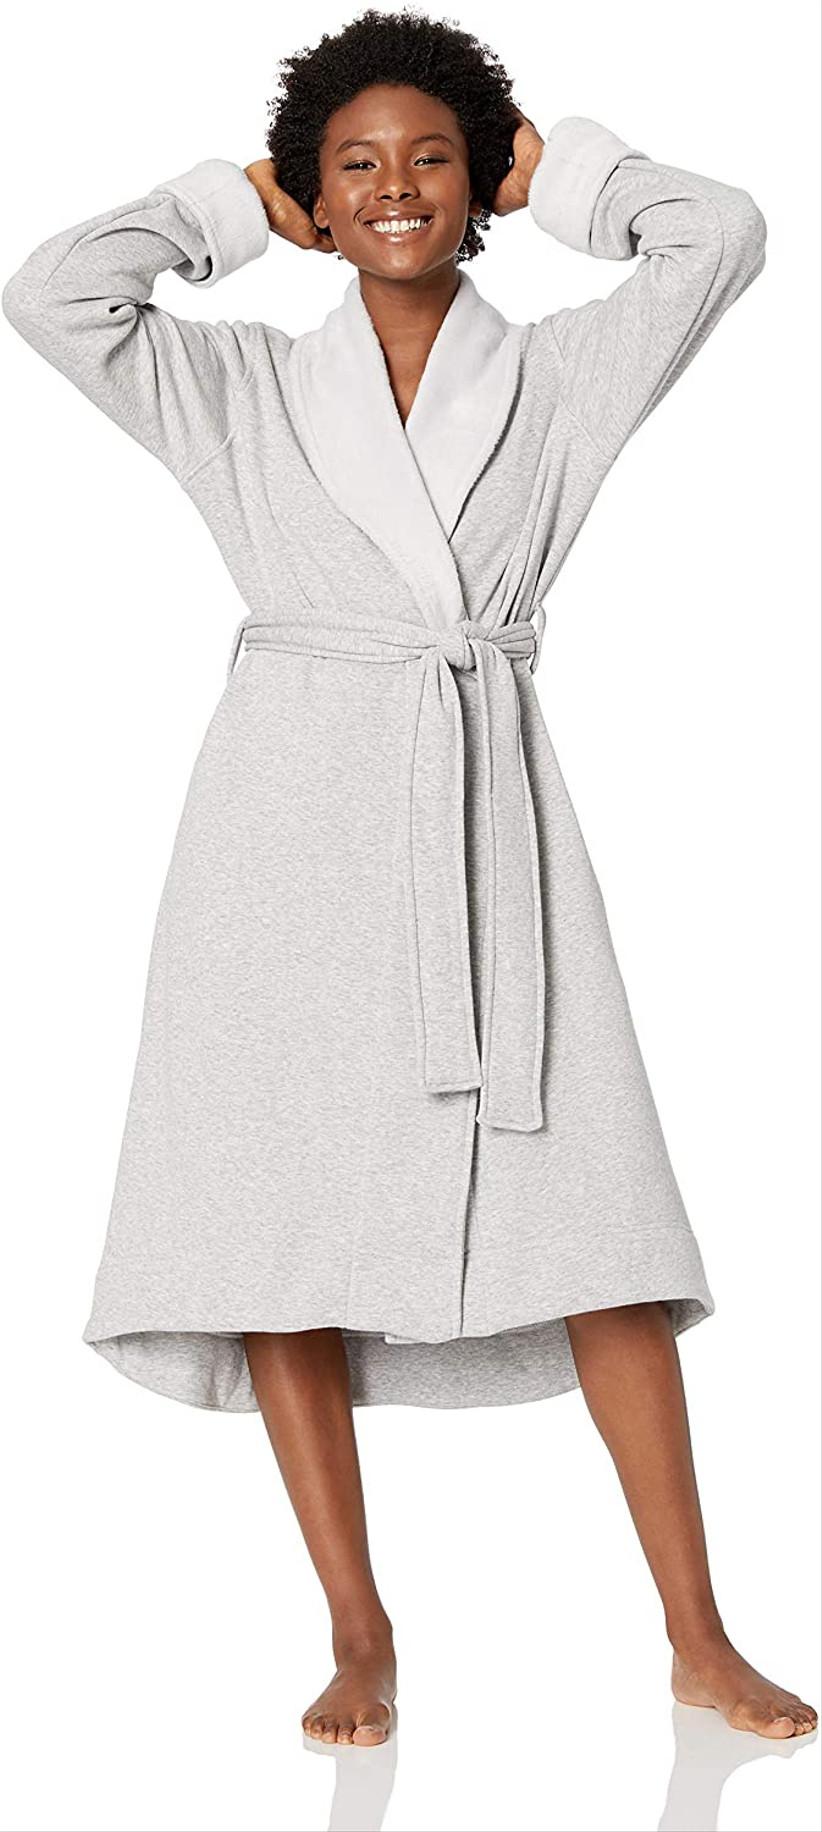 woman wearing gray robe